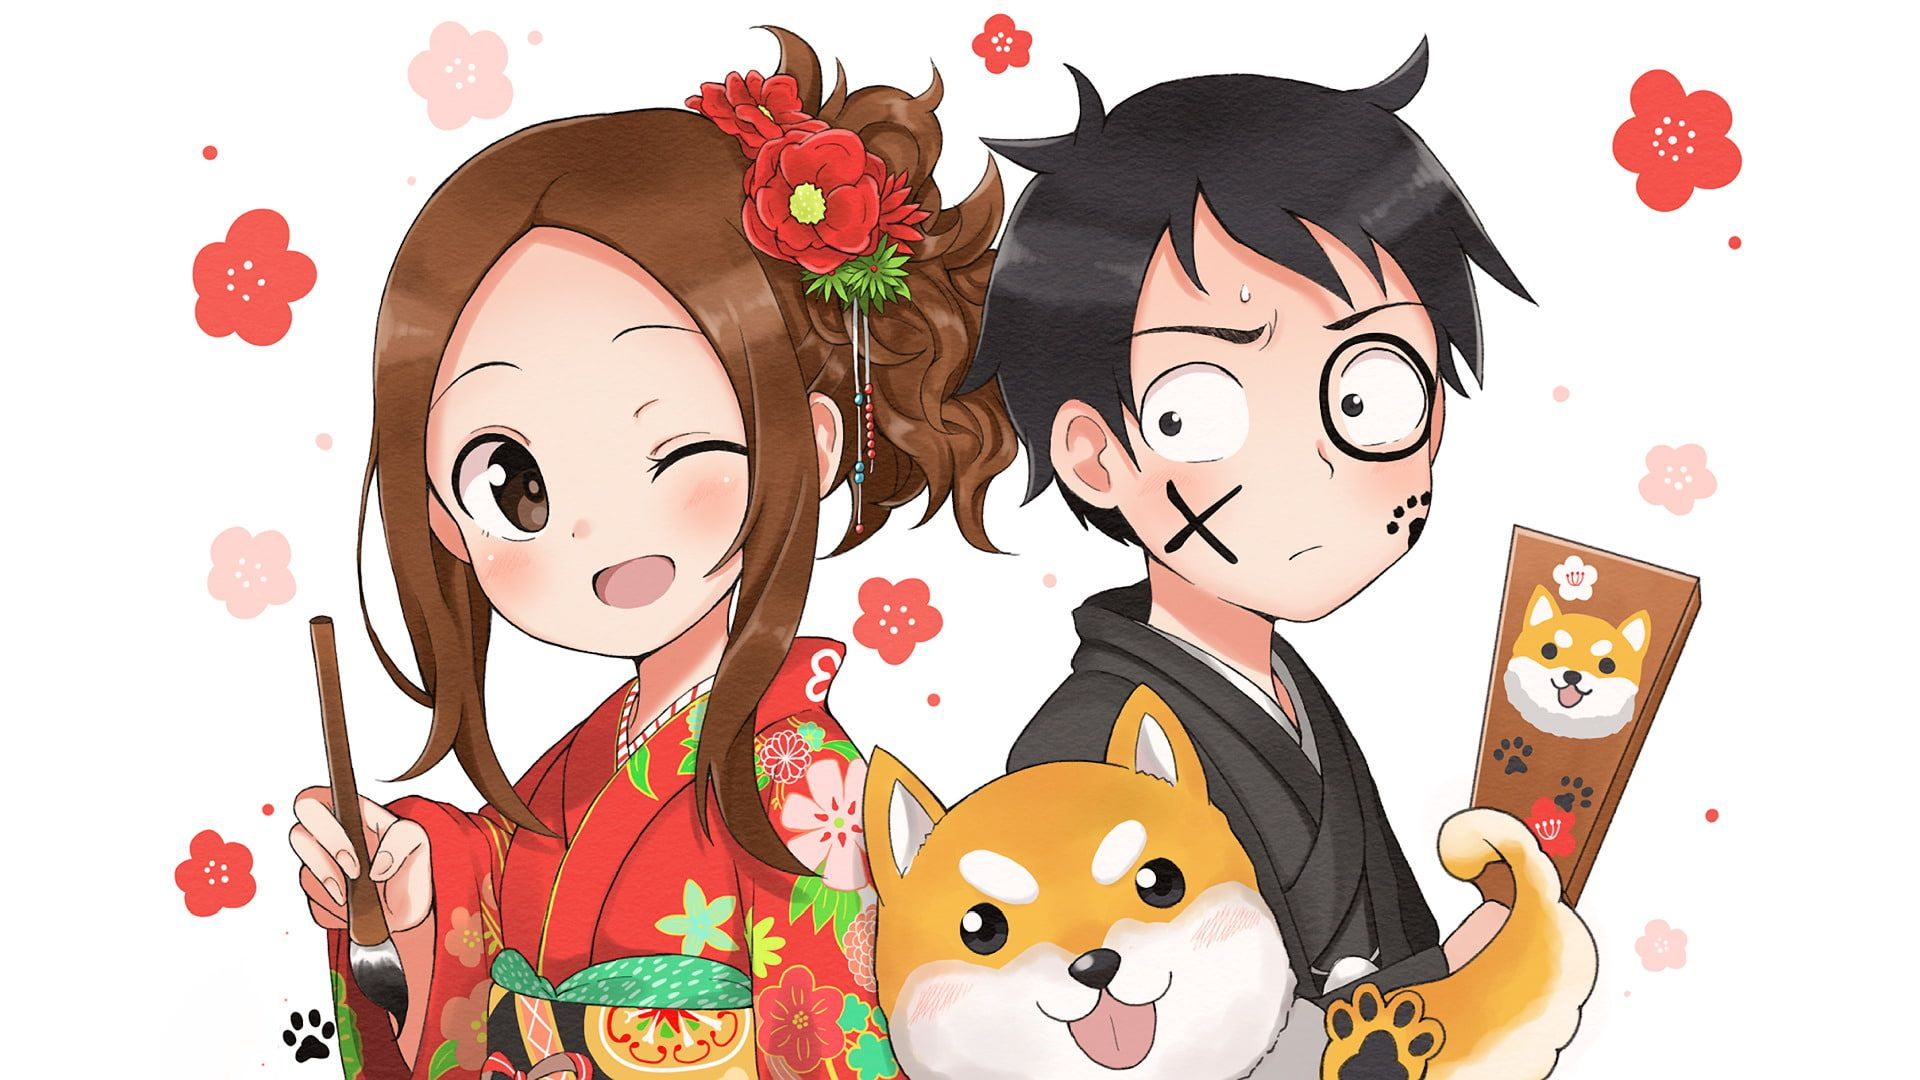 Anime Karakai Jouzu No Takagi San Nishikata Karakai Jouzu No Takagi San Takagi Karakai Jouzu No Takagi San 1080p Wallpaper Hdw Anime Takagi Anime Chibi